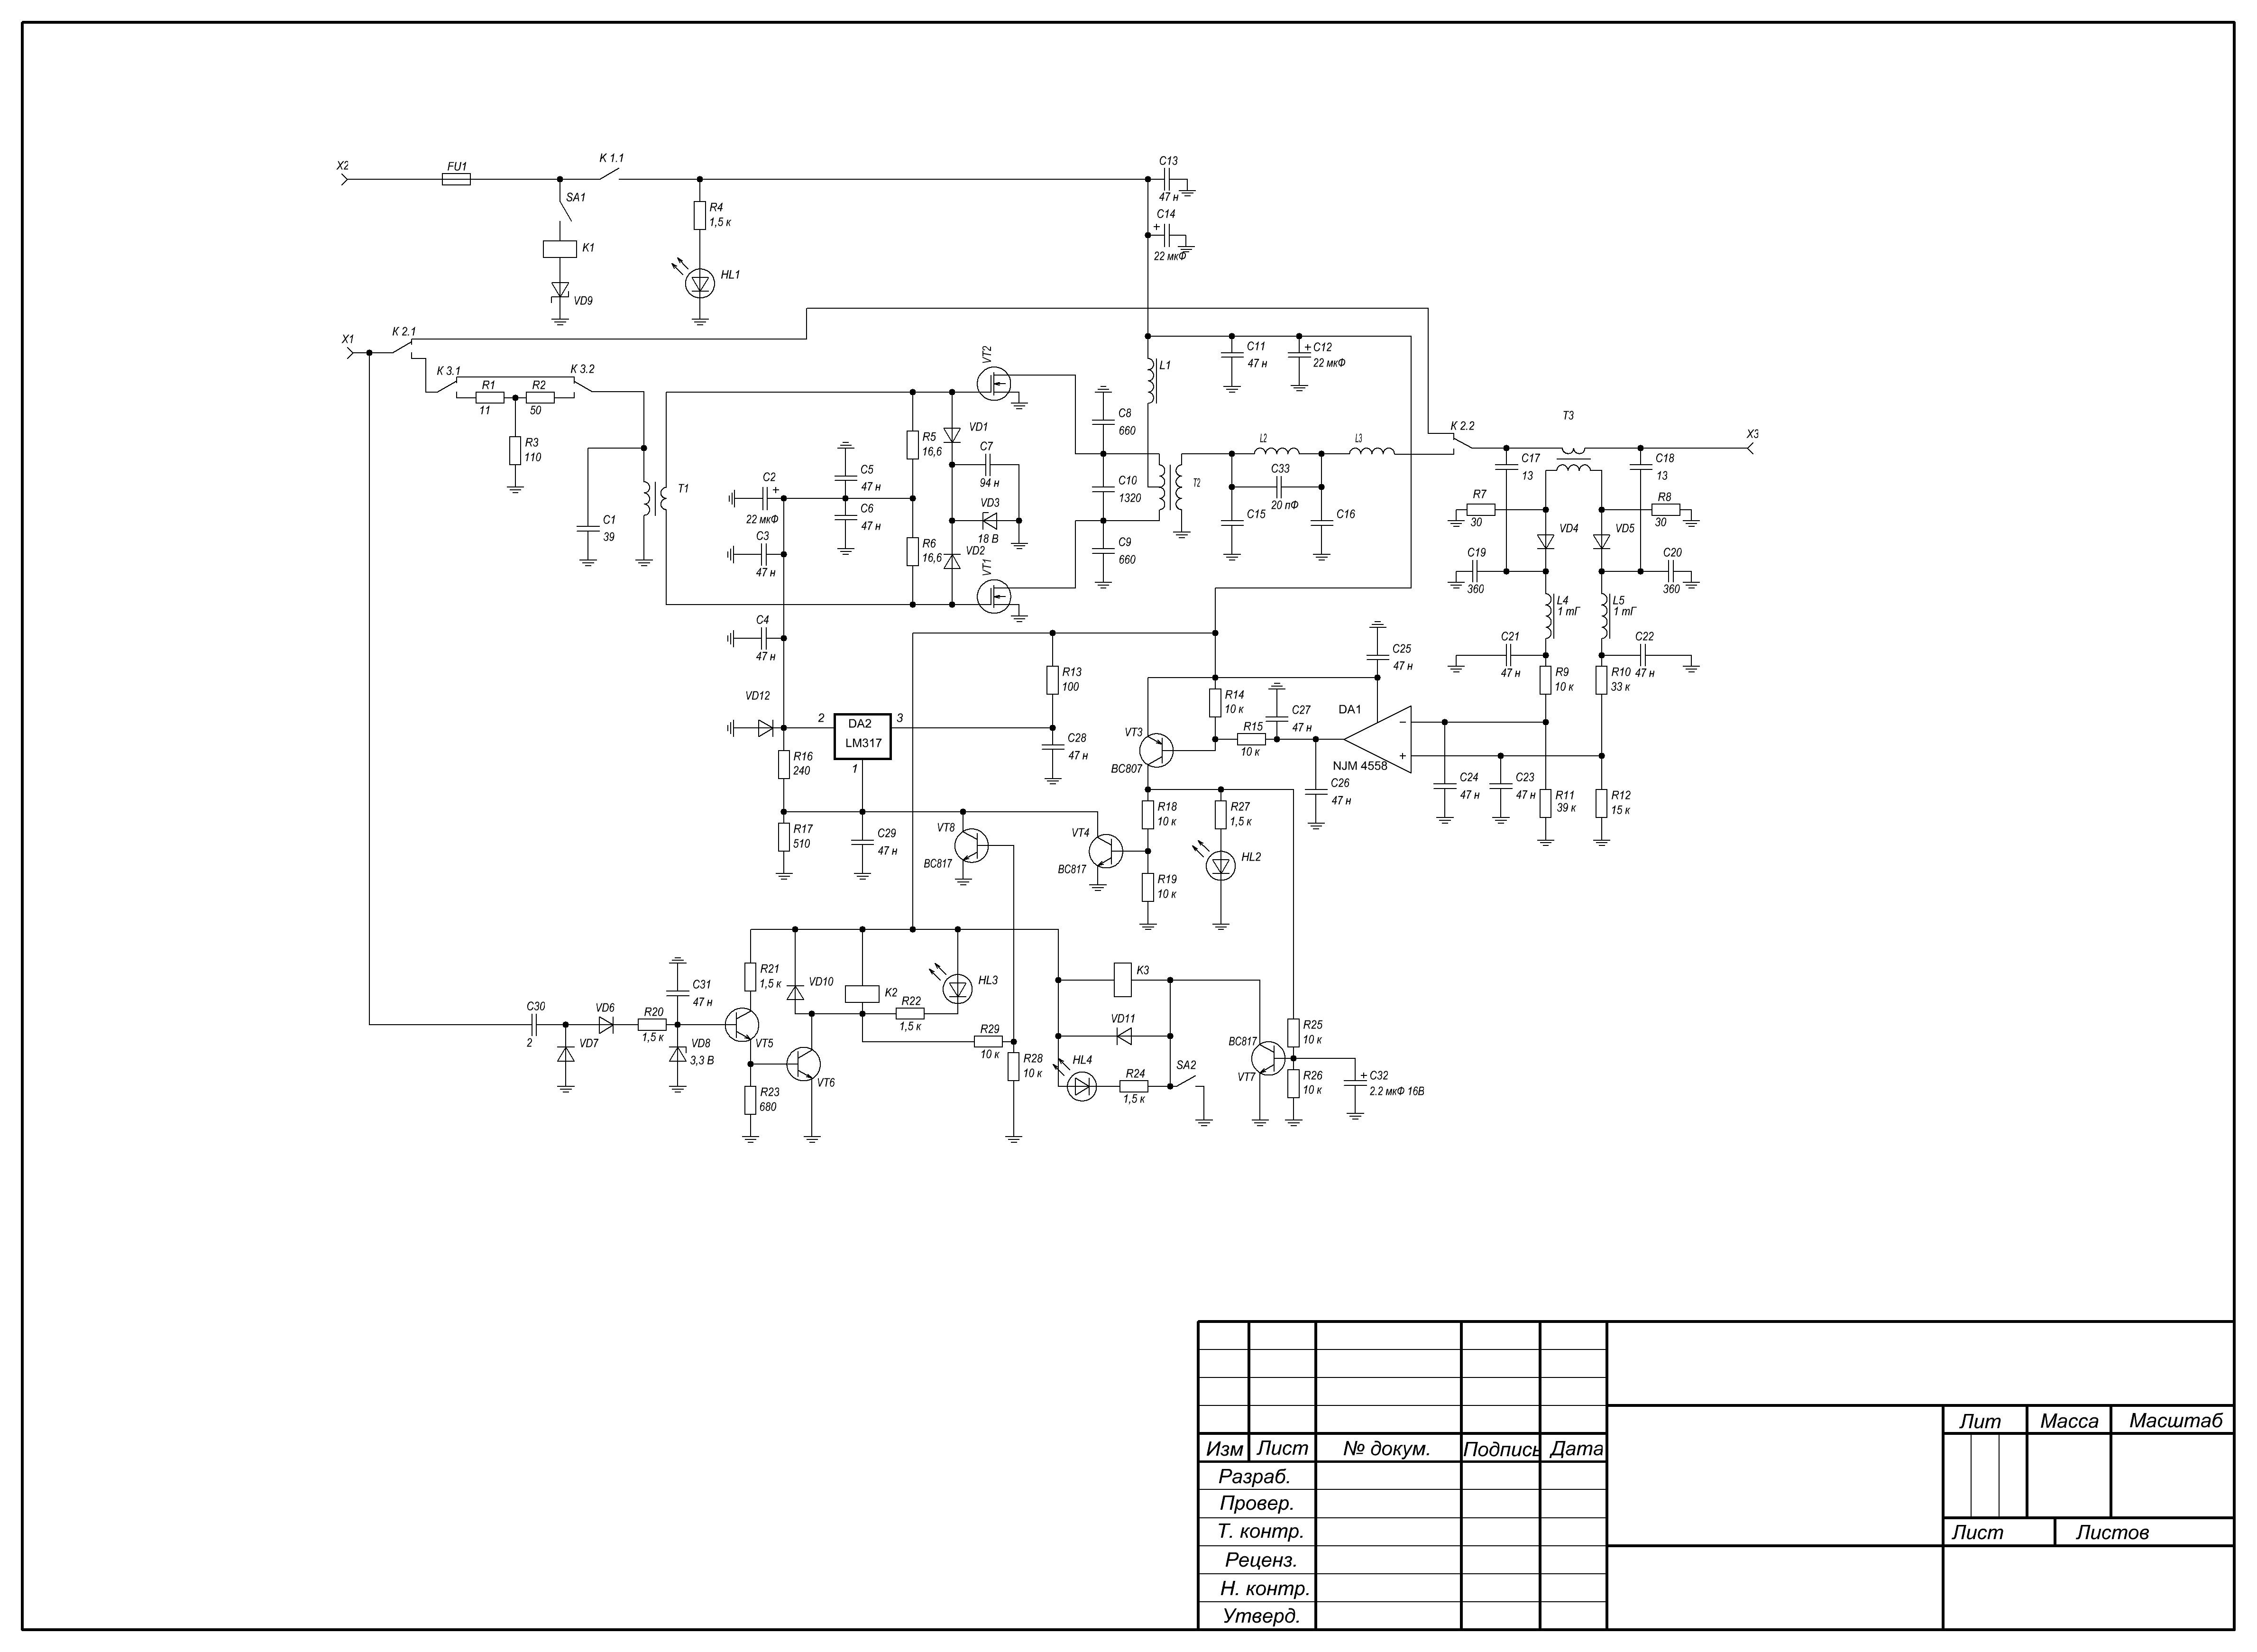 Alan 48 plus smd схема